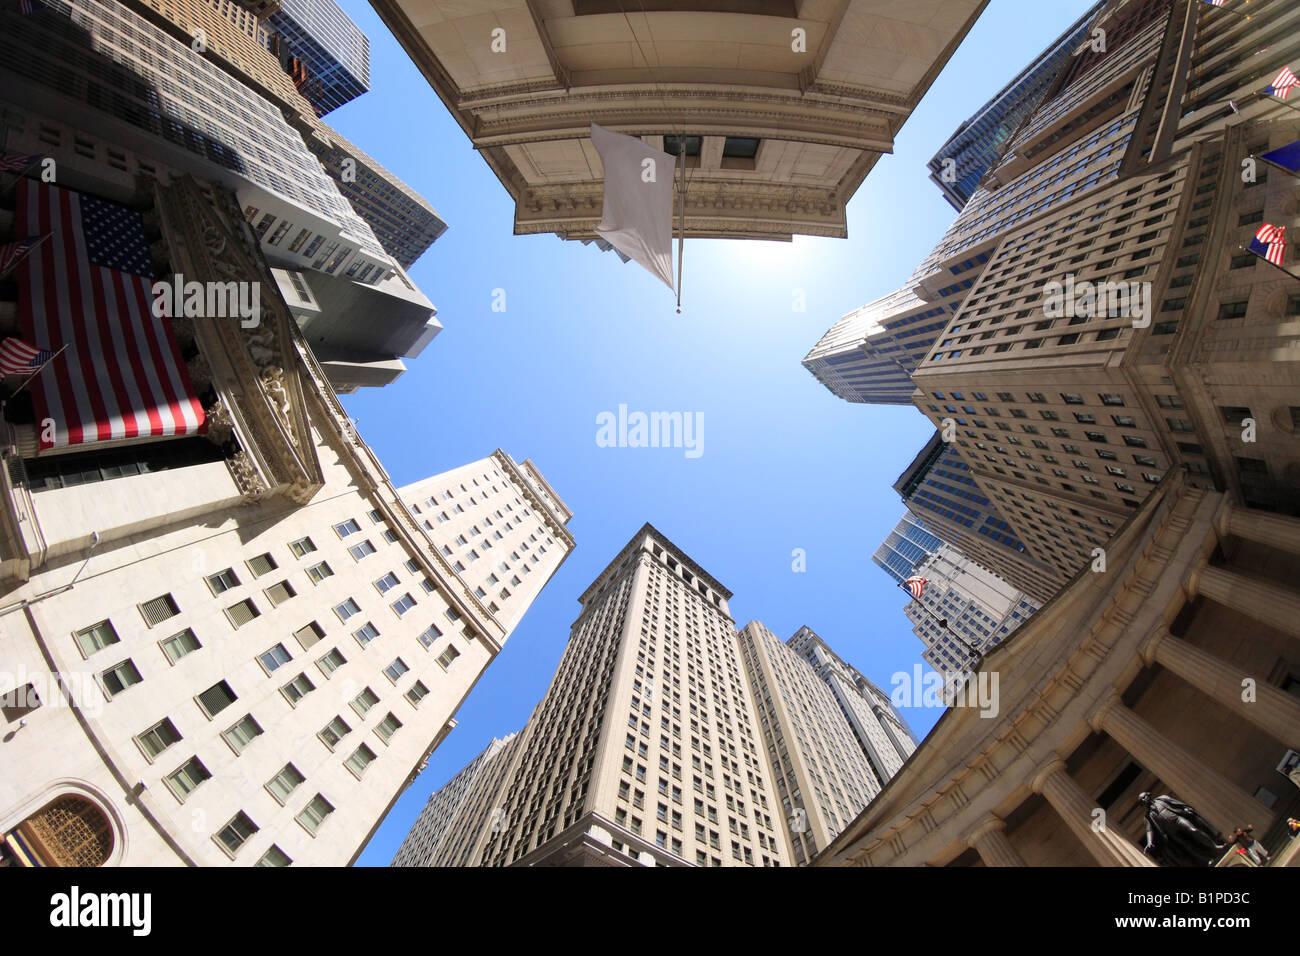 Fisheye view of Wall Street buildings - New York City, USA - Stock Image